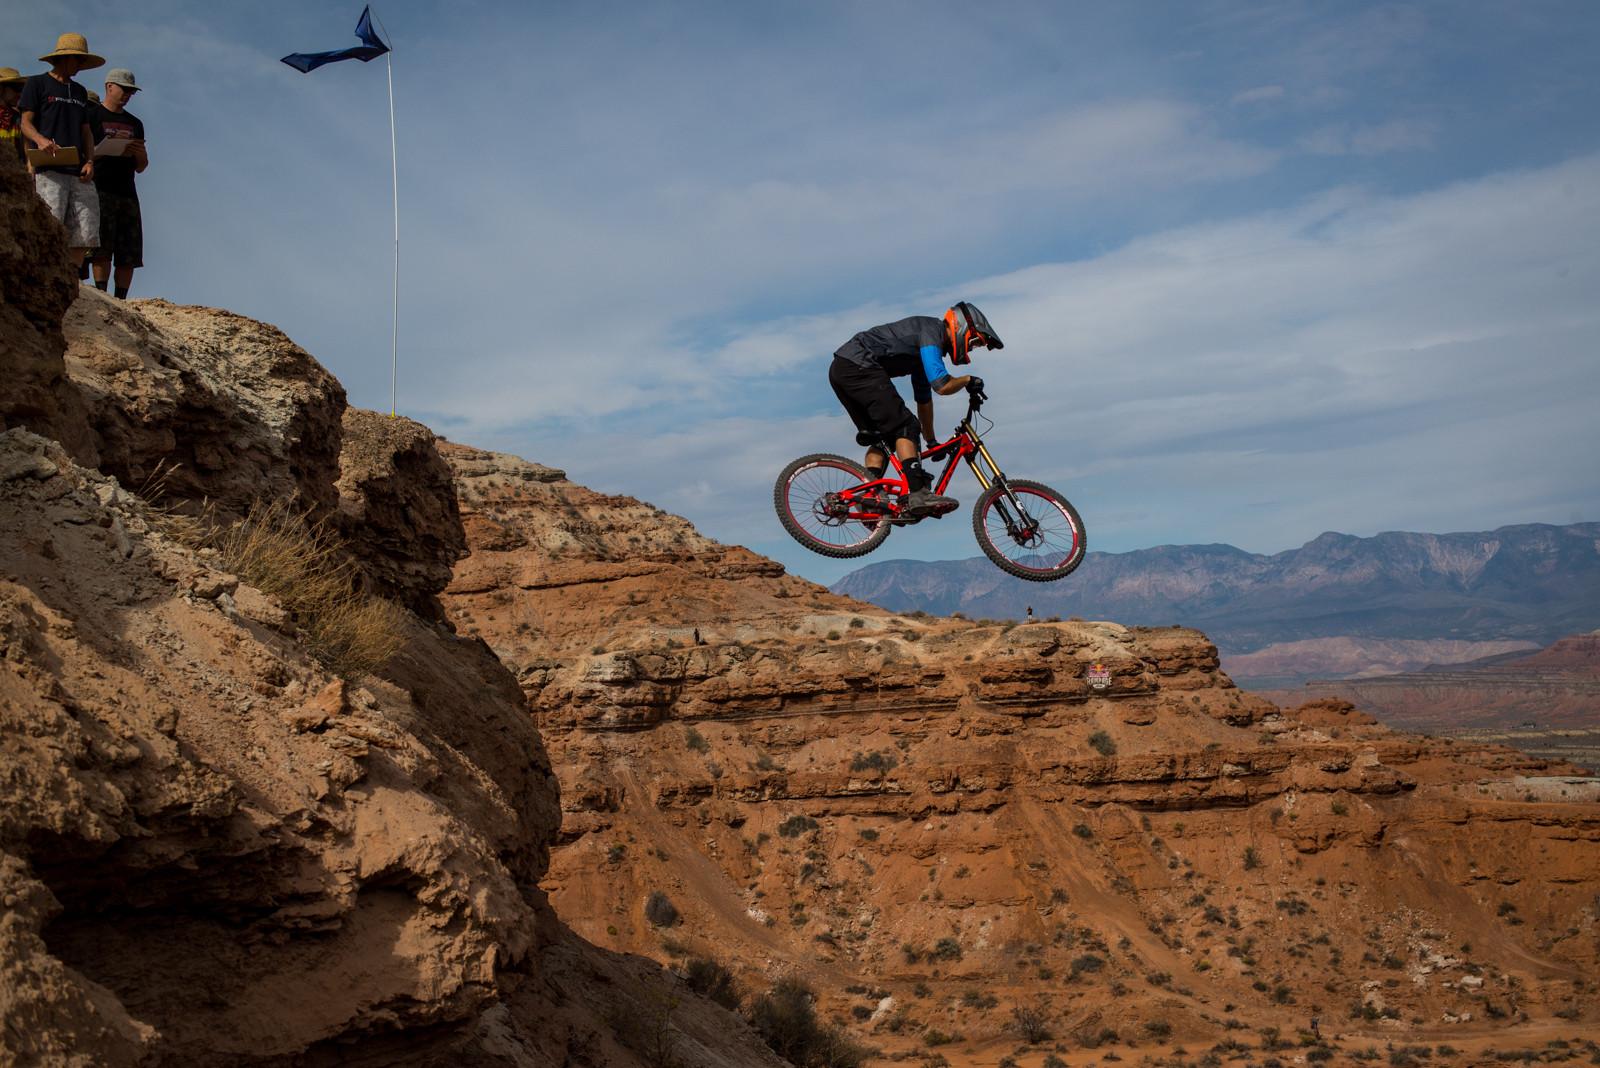 Paul Basagoitia - 2015 Red Bull Rampage Finals - Mountain Biking Pictures - Vital MTB